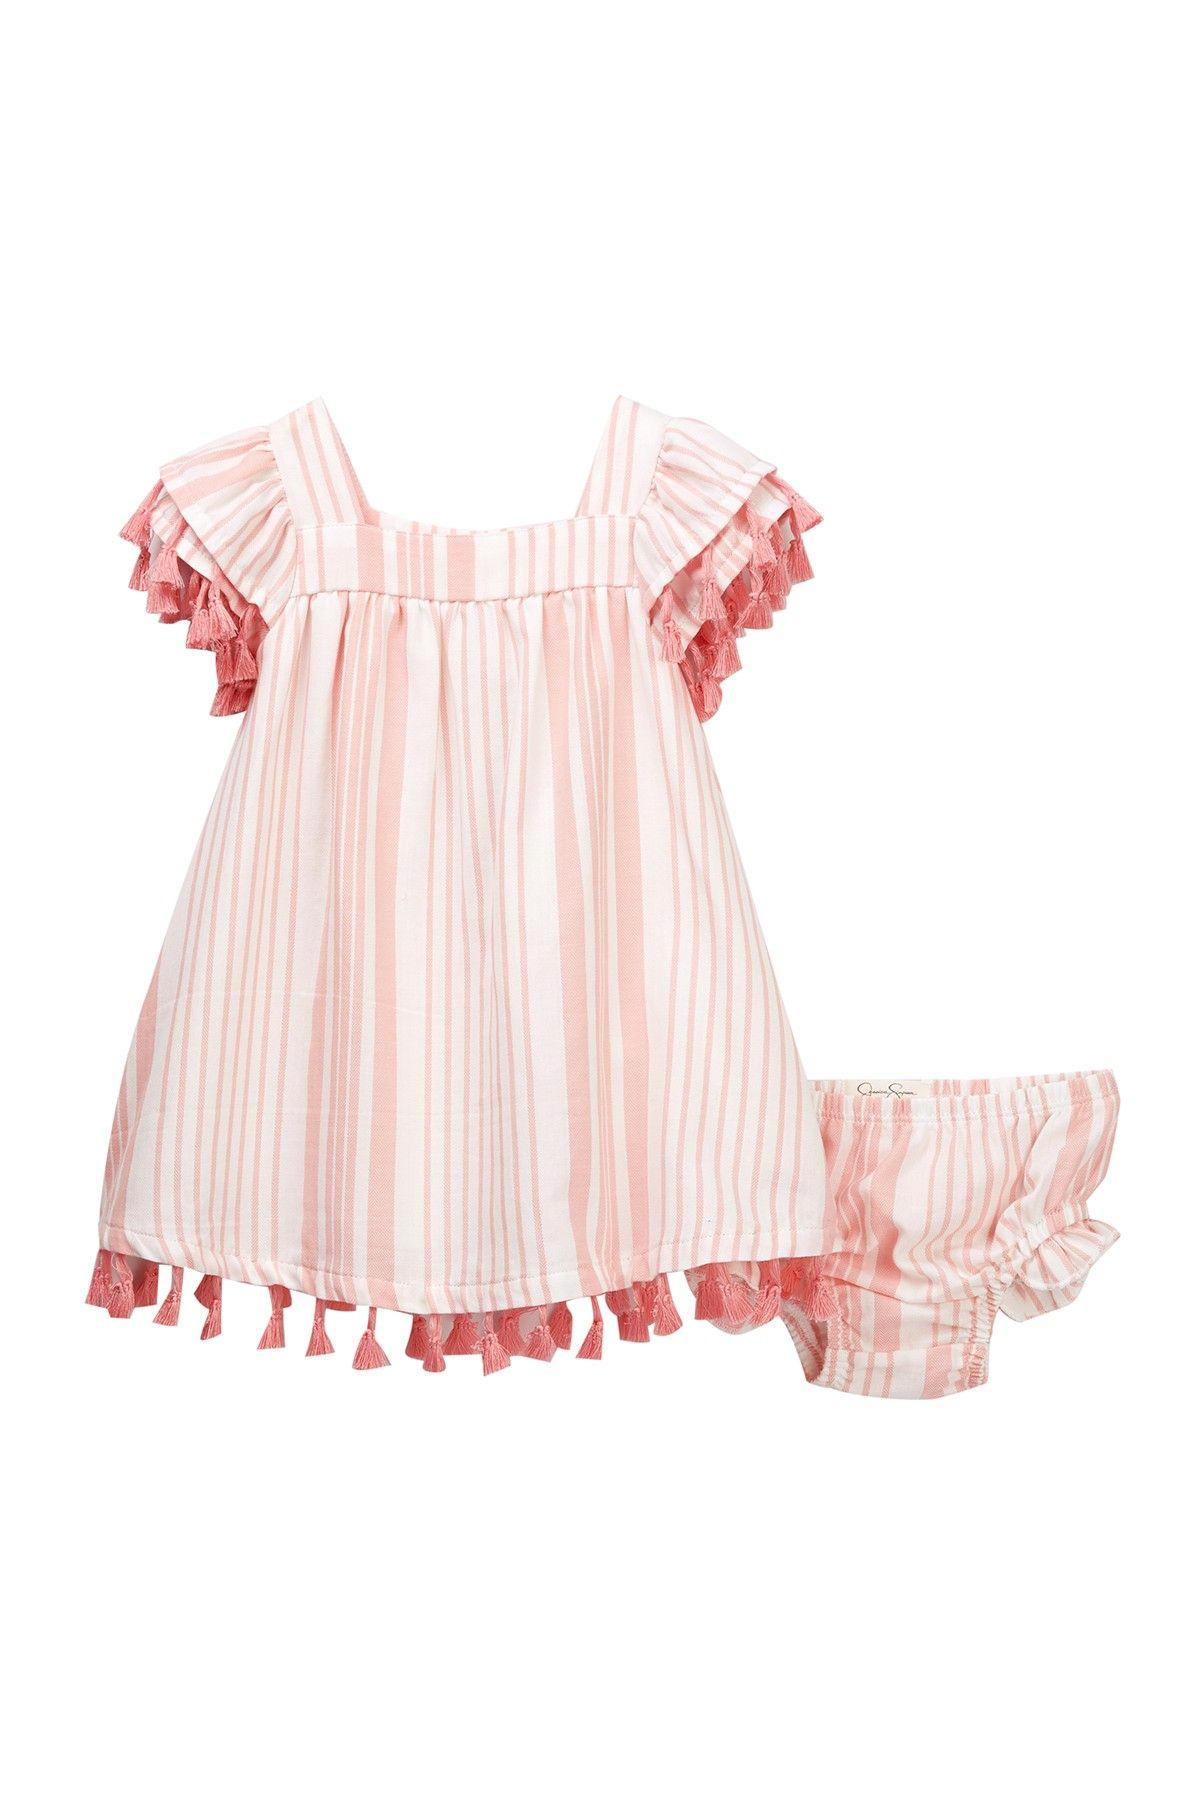 5d7dfd7c1 Tassel Trim Dress & Bloomer Set (Baby Girls) by Jessica Simpson on  @nordstrom_rack